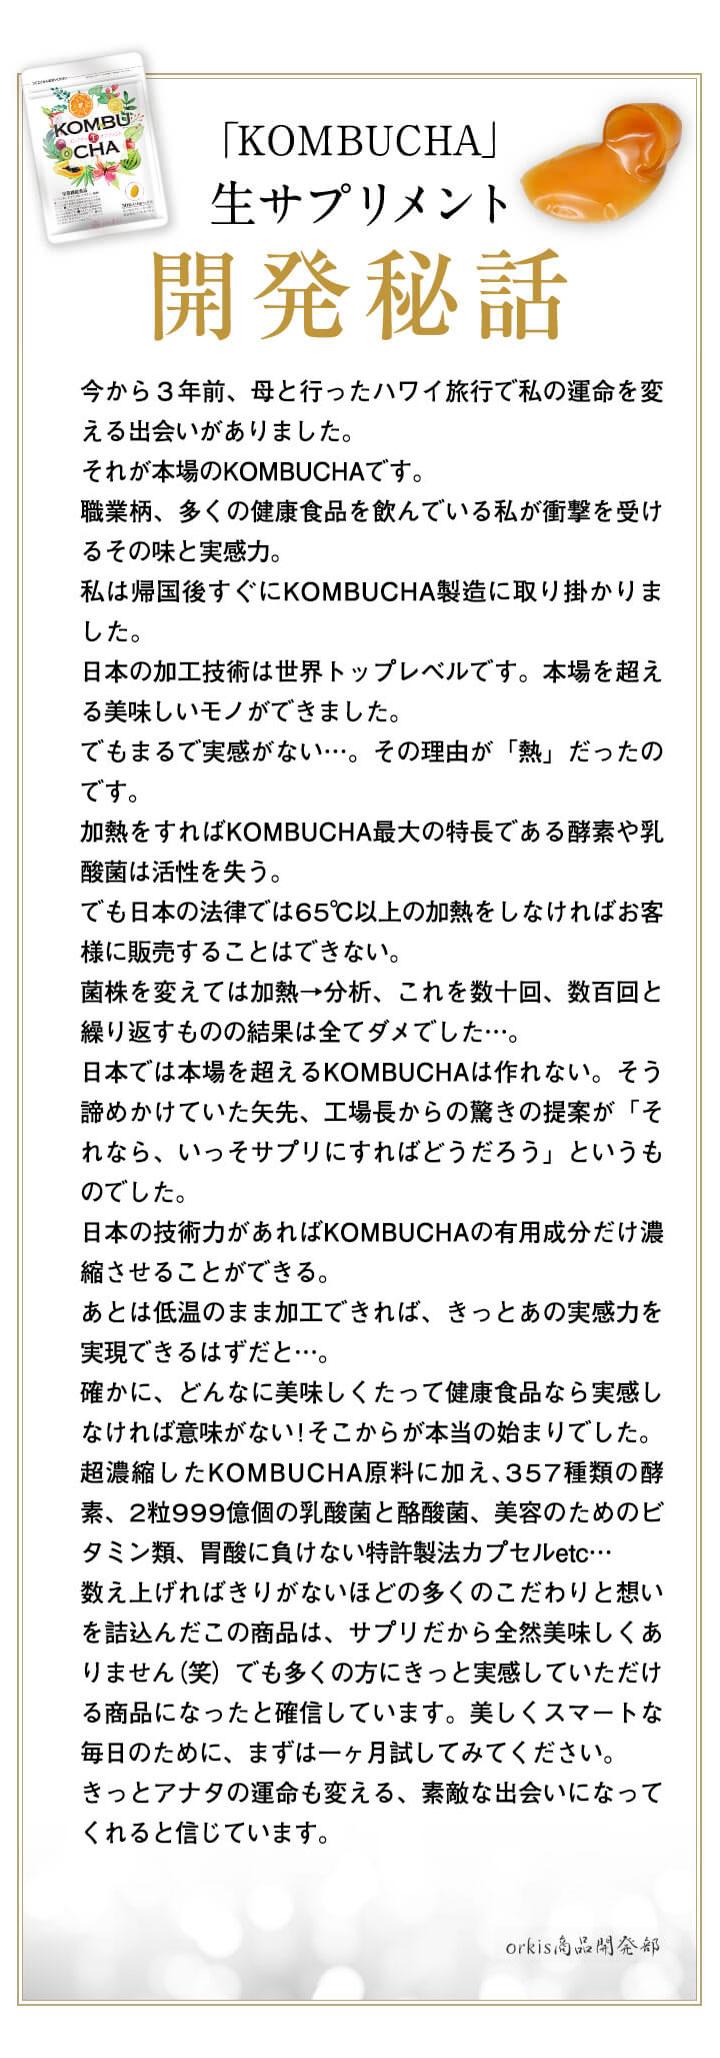 KOMBUCHA生サプリメント開発部秘話